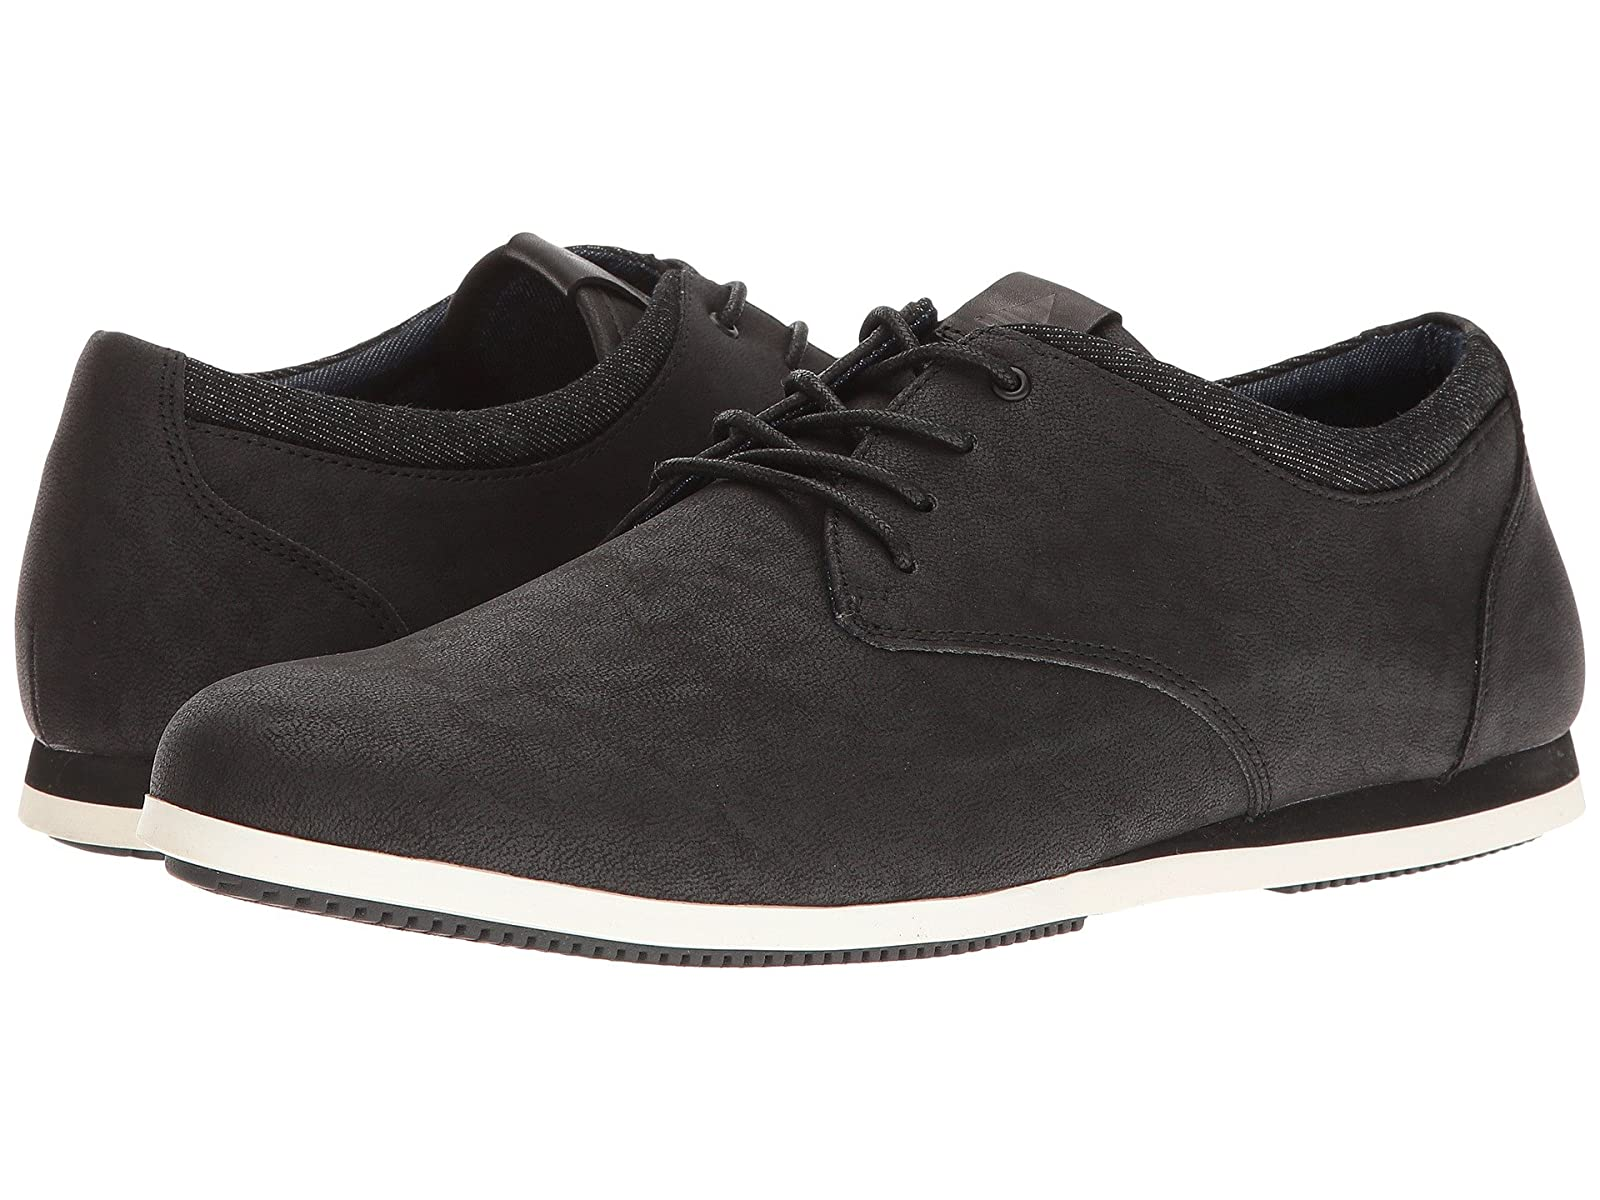 ALDO Aauwen-RAtmospheric grades have affordable shoes